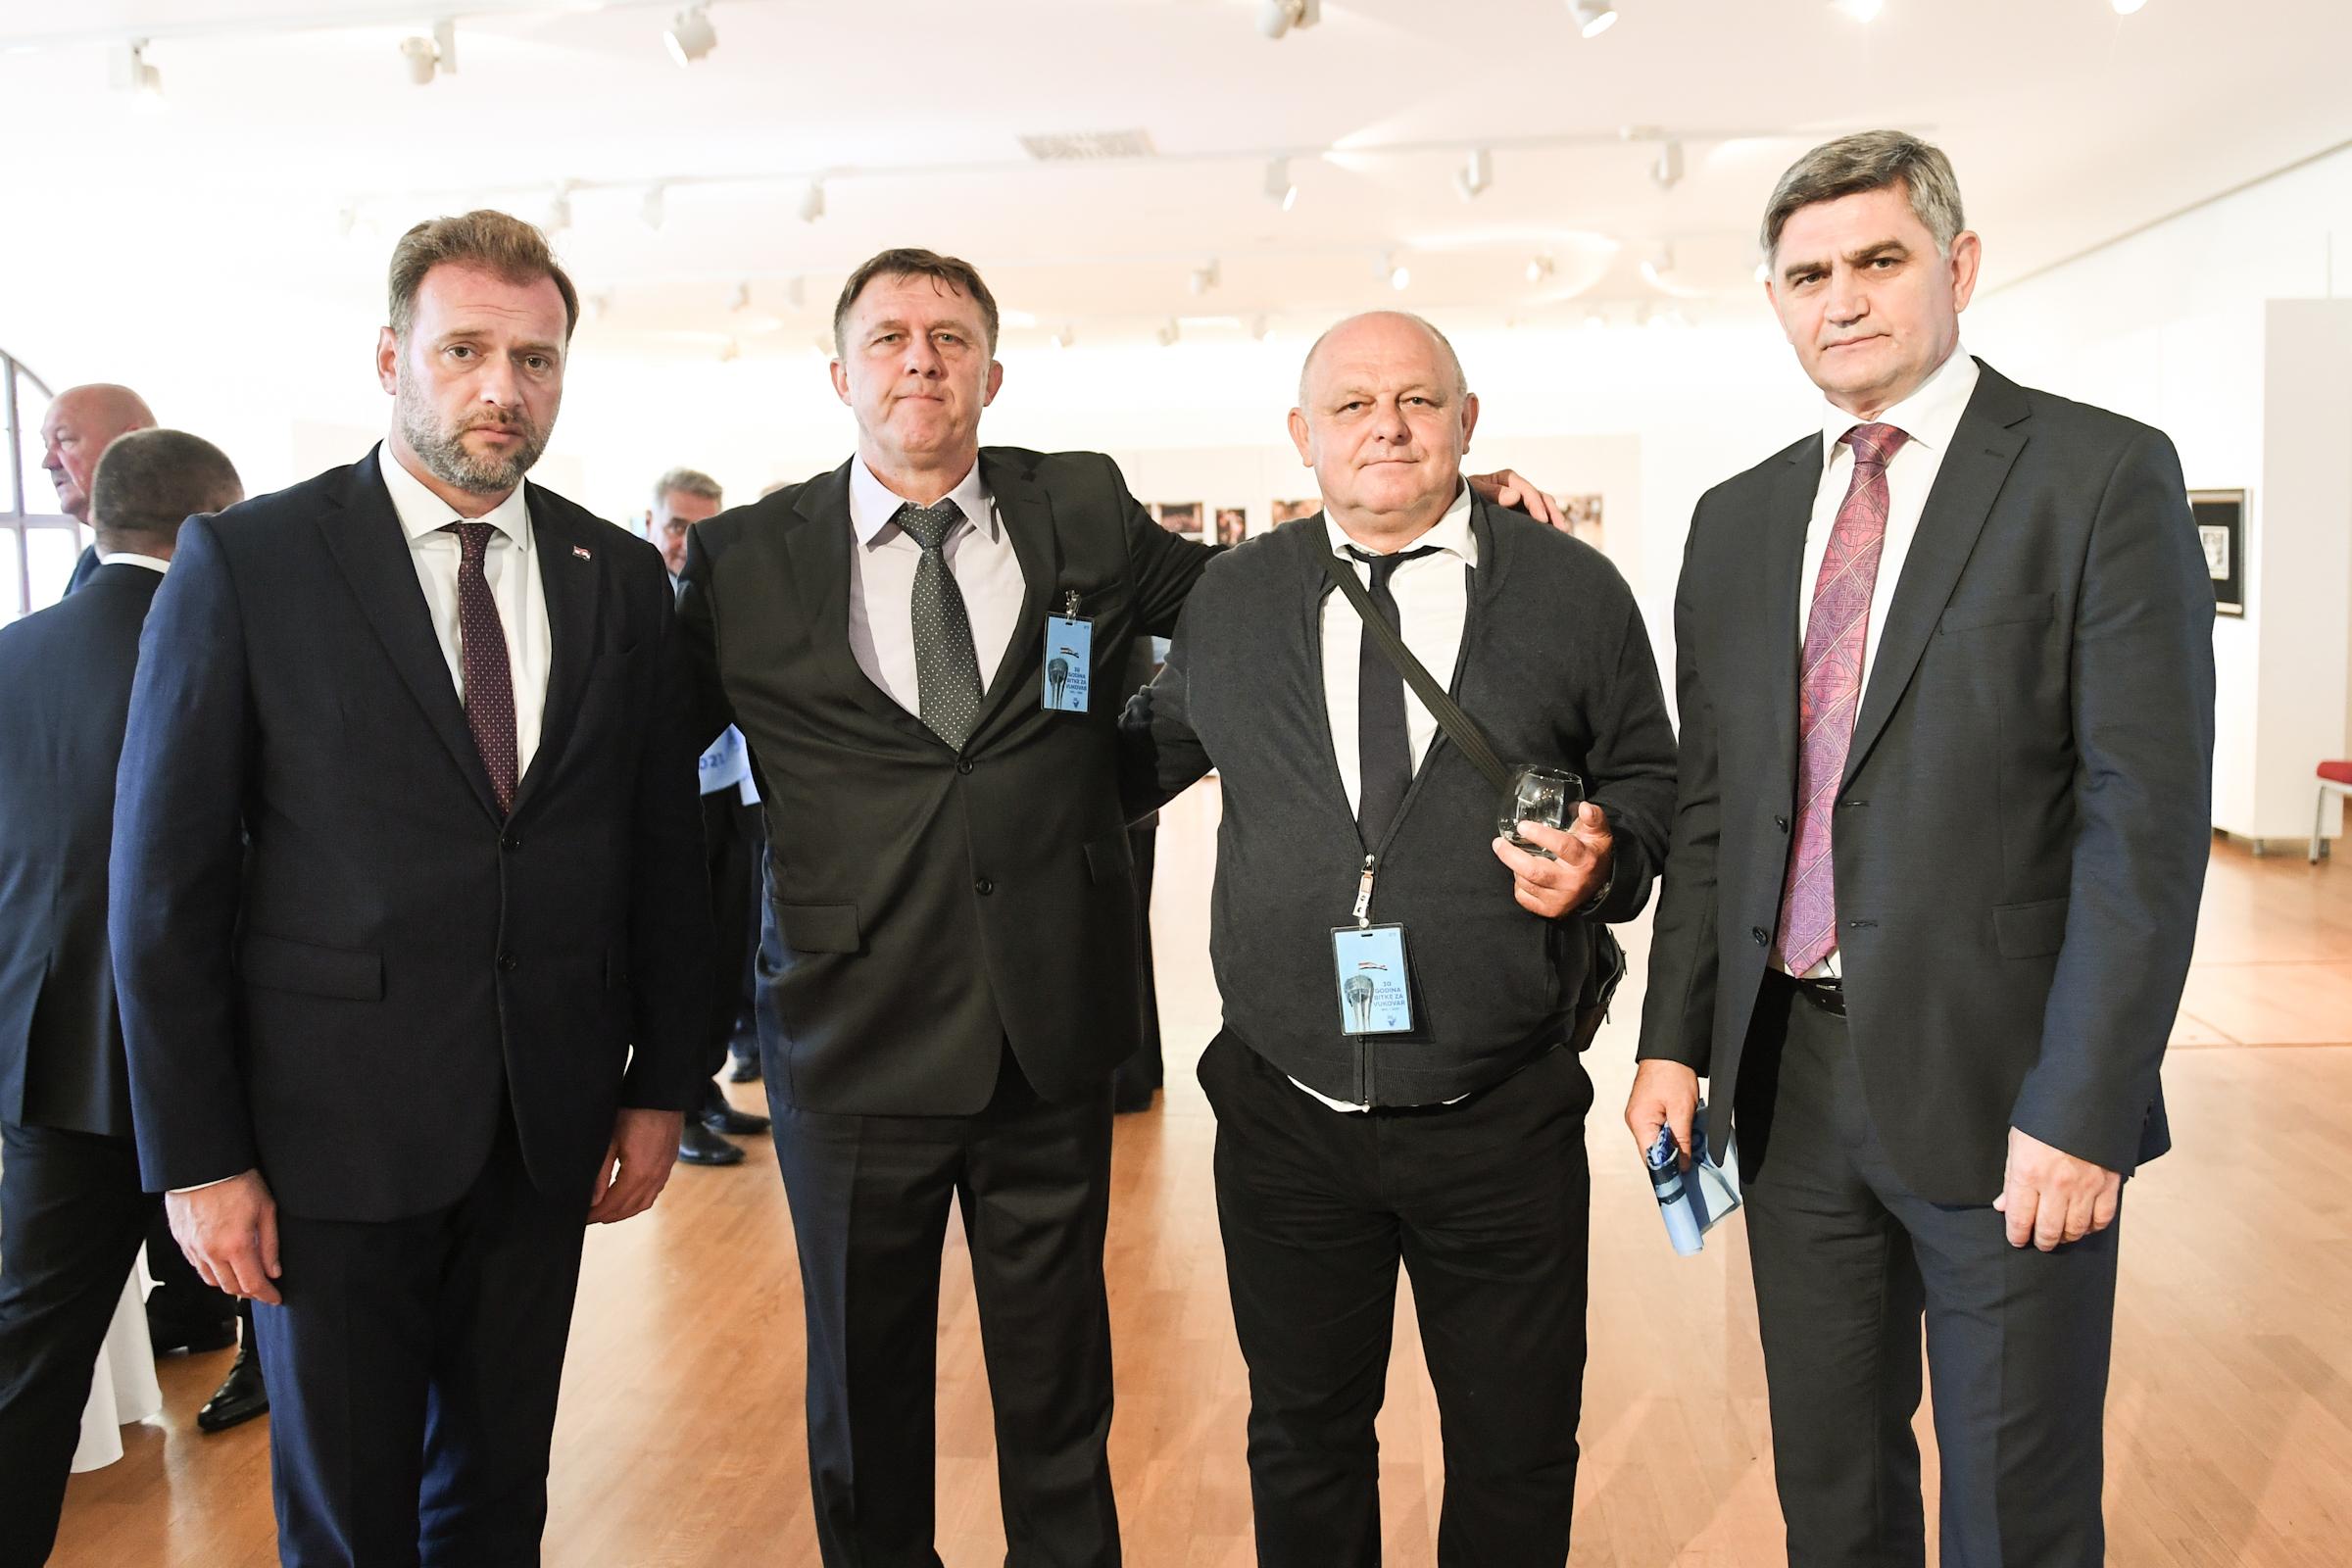 Ministar Banožić na obilježavanju 30. obljetnice Bitke za Vukovar